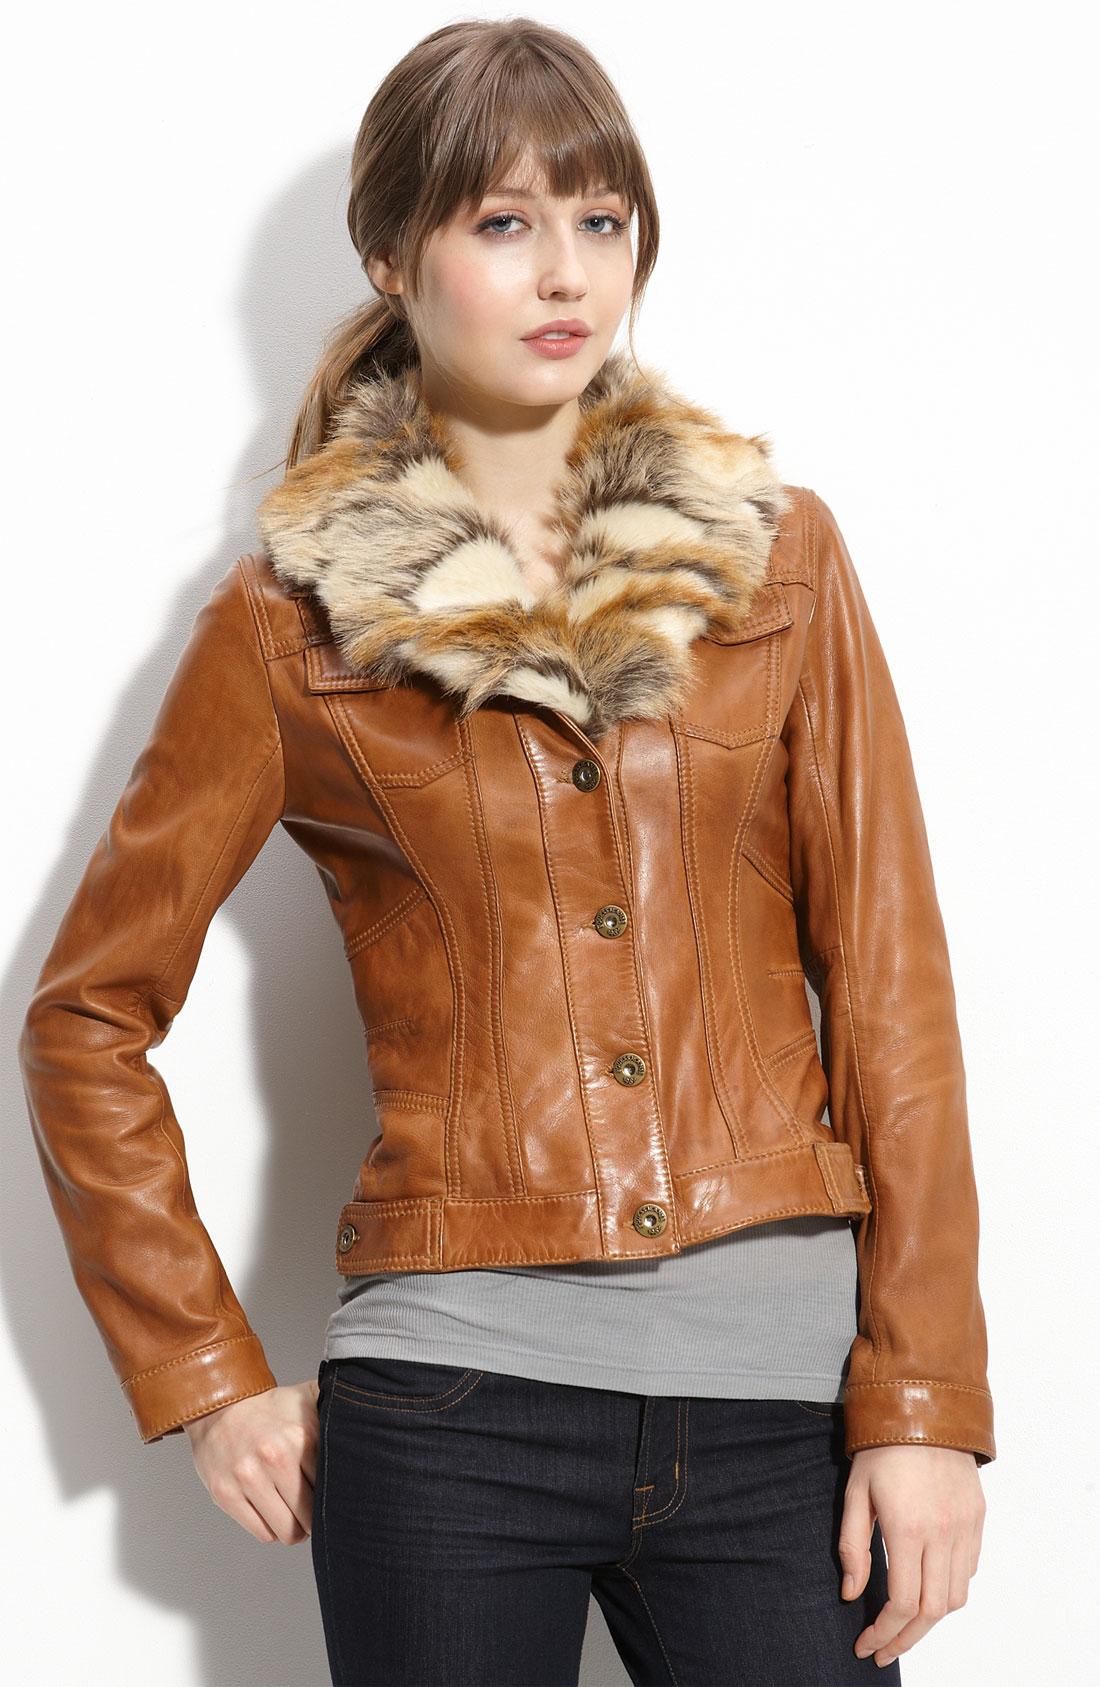 Etcetera Women's Size 4 Beautiful Brown Faux Fur Jacket Short Sleeve American Rag Cie Brown Faux Leather Faux Fur Collar Jacket Women's XS. American Rag Cie · Size (Women's):XS · Faux Leather. $ or Best Offer. Free Shipping. Winter Warm Fluffy Coat Faux Fur Jacket Outerwear Sweater Coat Fashion Women's.